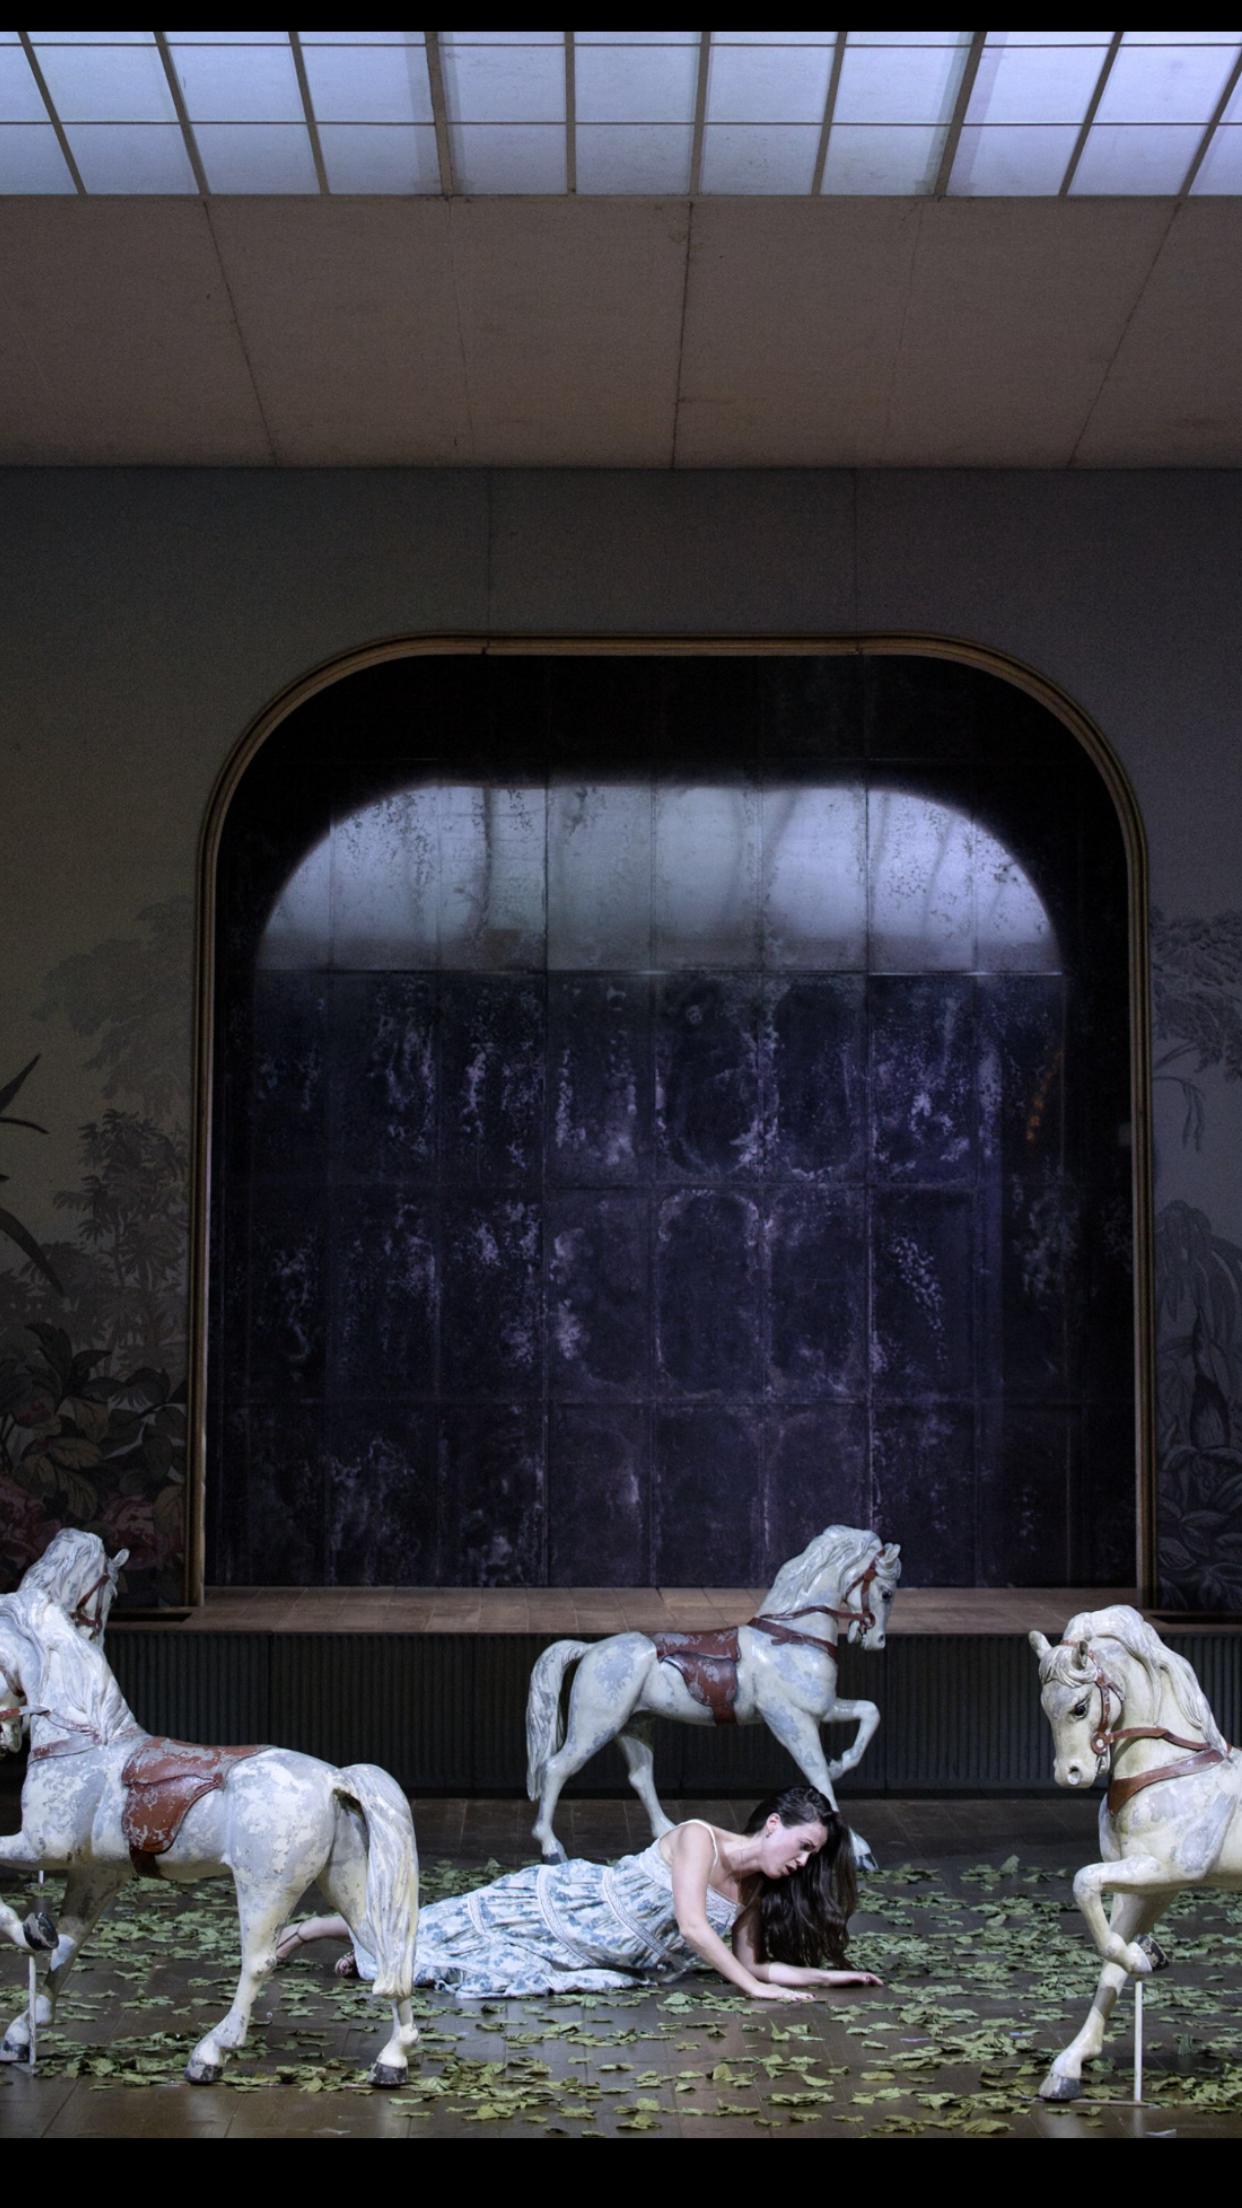 Barbarina - Le Nozze di Figaro - Opernhaus Zürich 2016 - Photo: Judith Schlosser